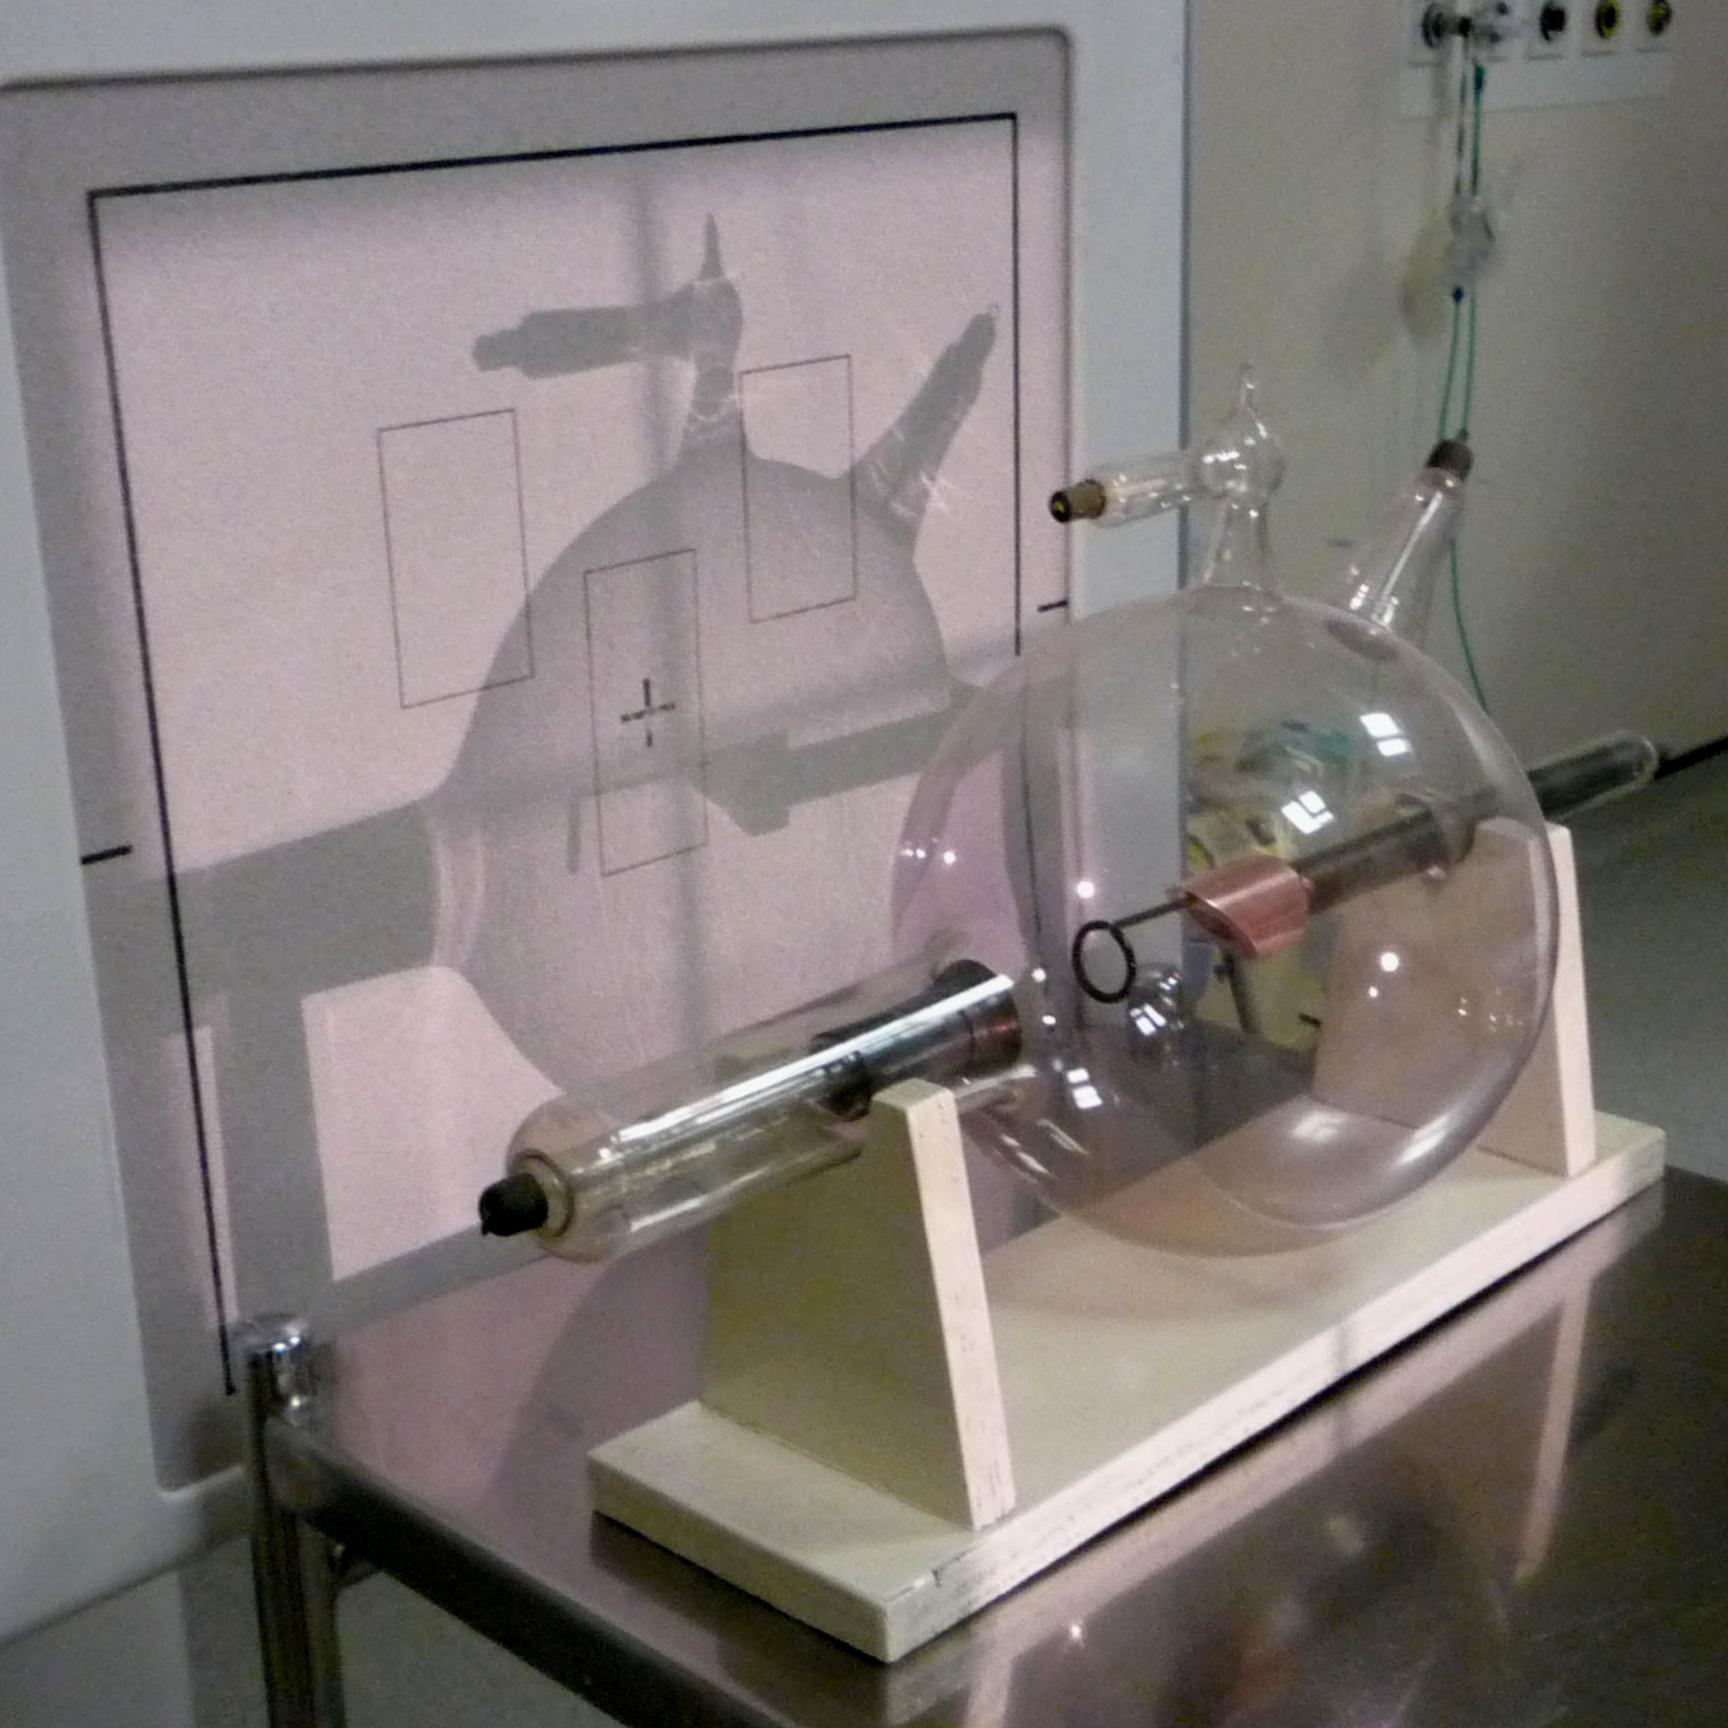 x-ray%2Btube%2B%2Bcopy.jpg